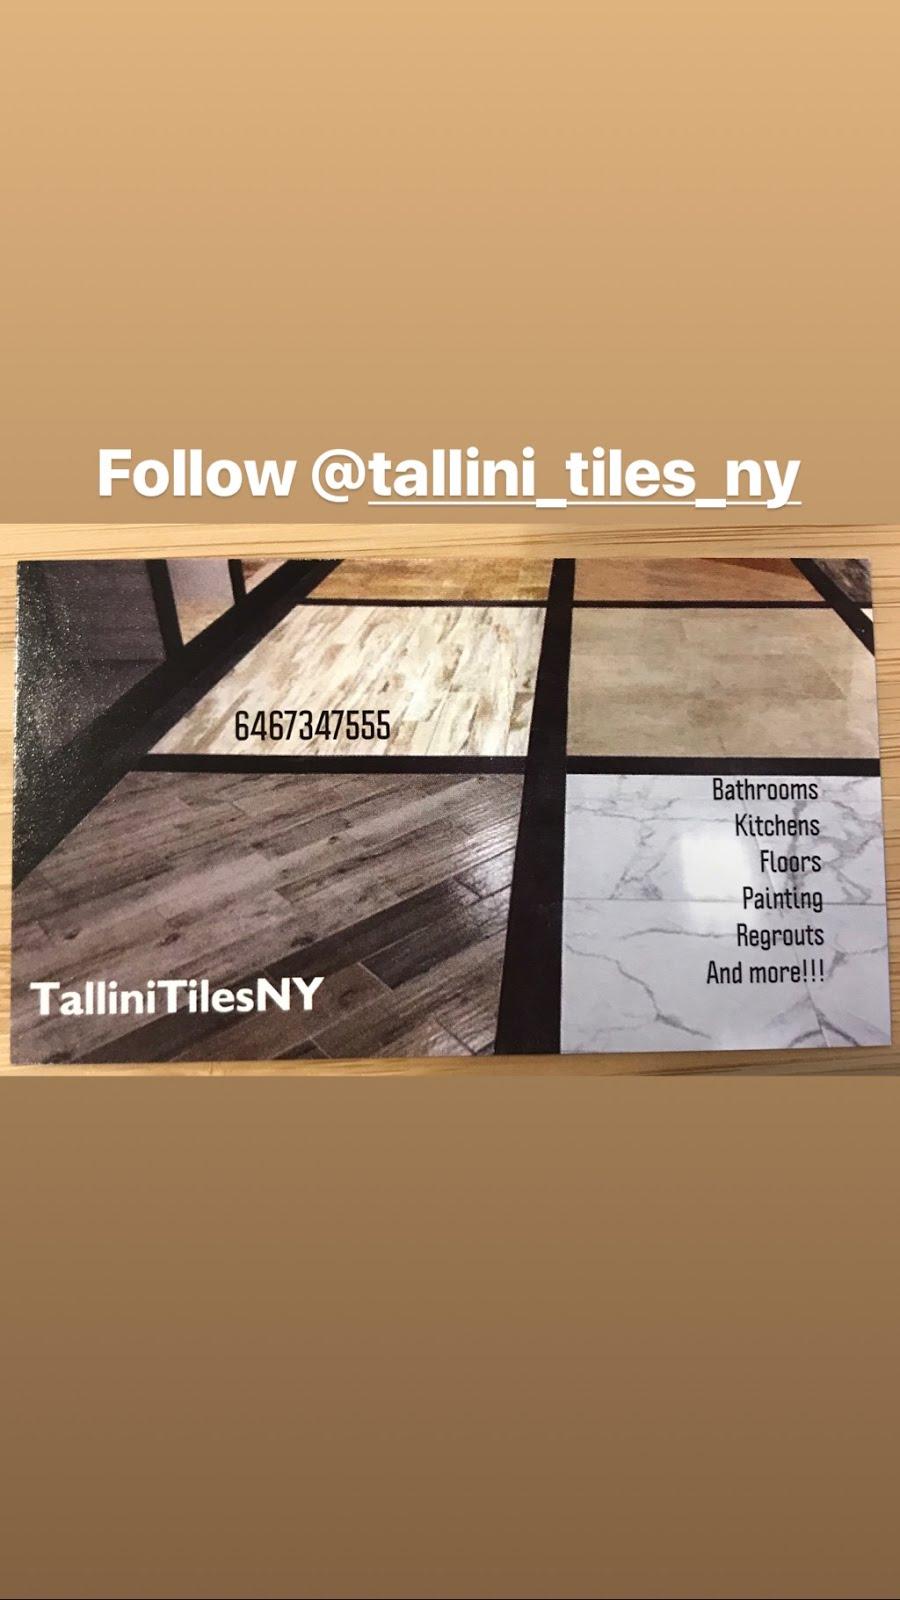 TALLINI TILES NYC